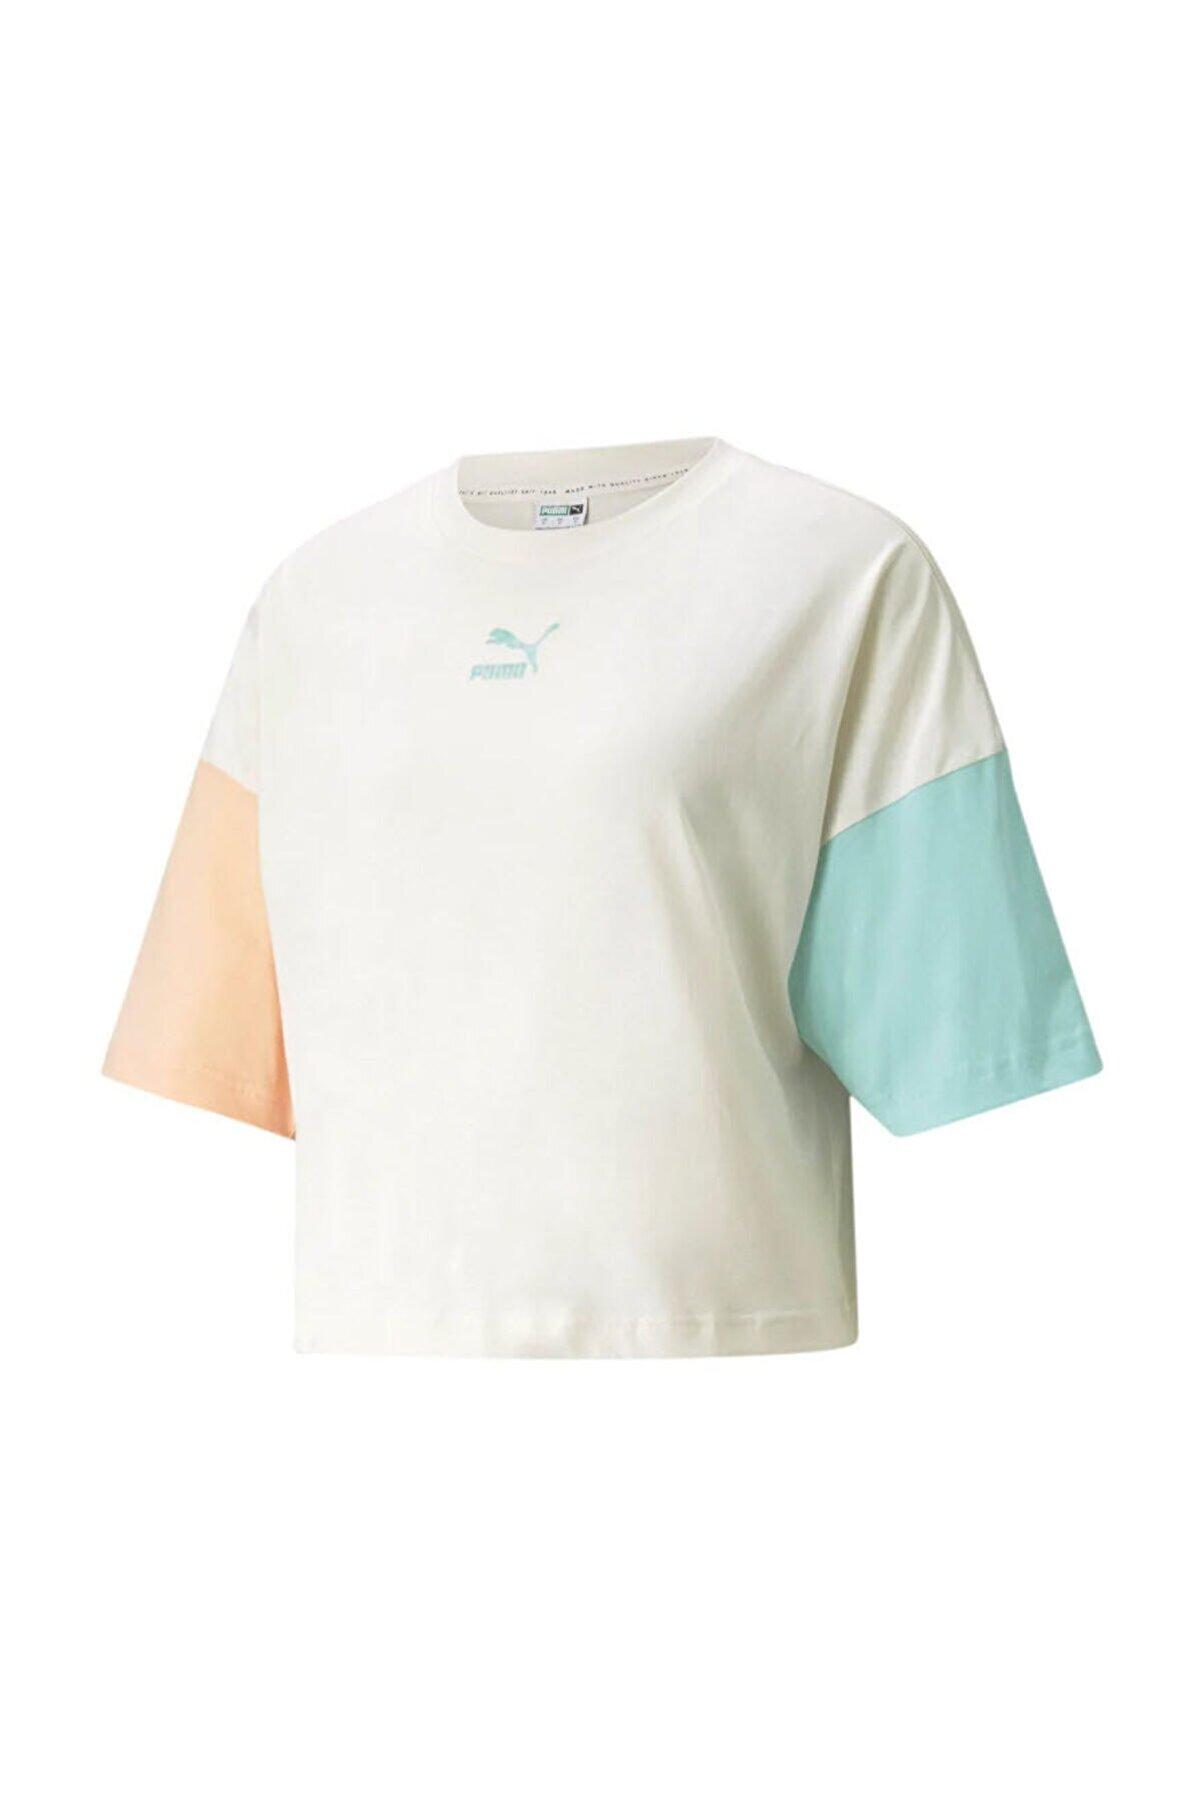 Puma Kadın Spor T-Shirt - CLSX Boyfriend - 53169688